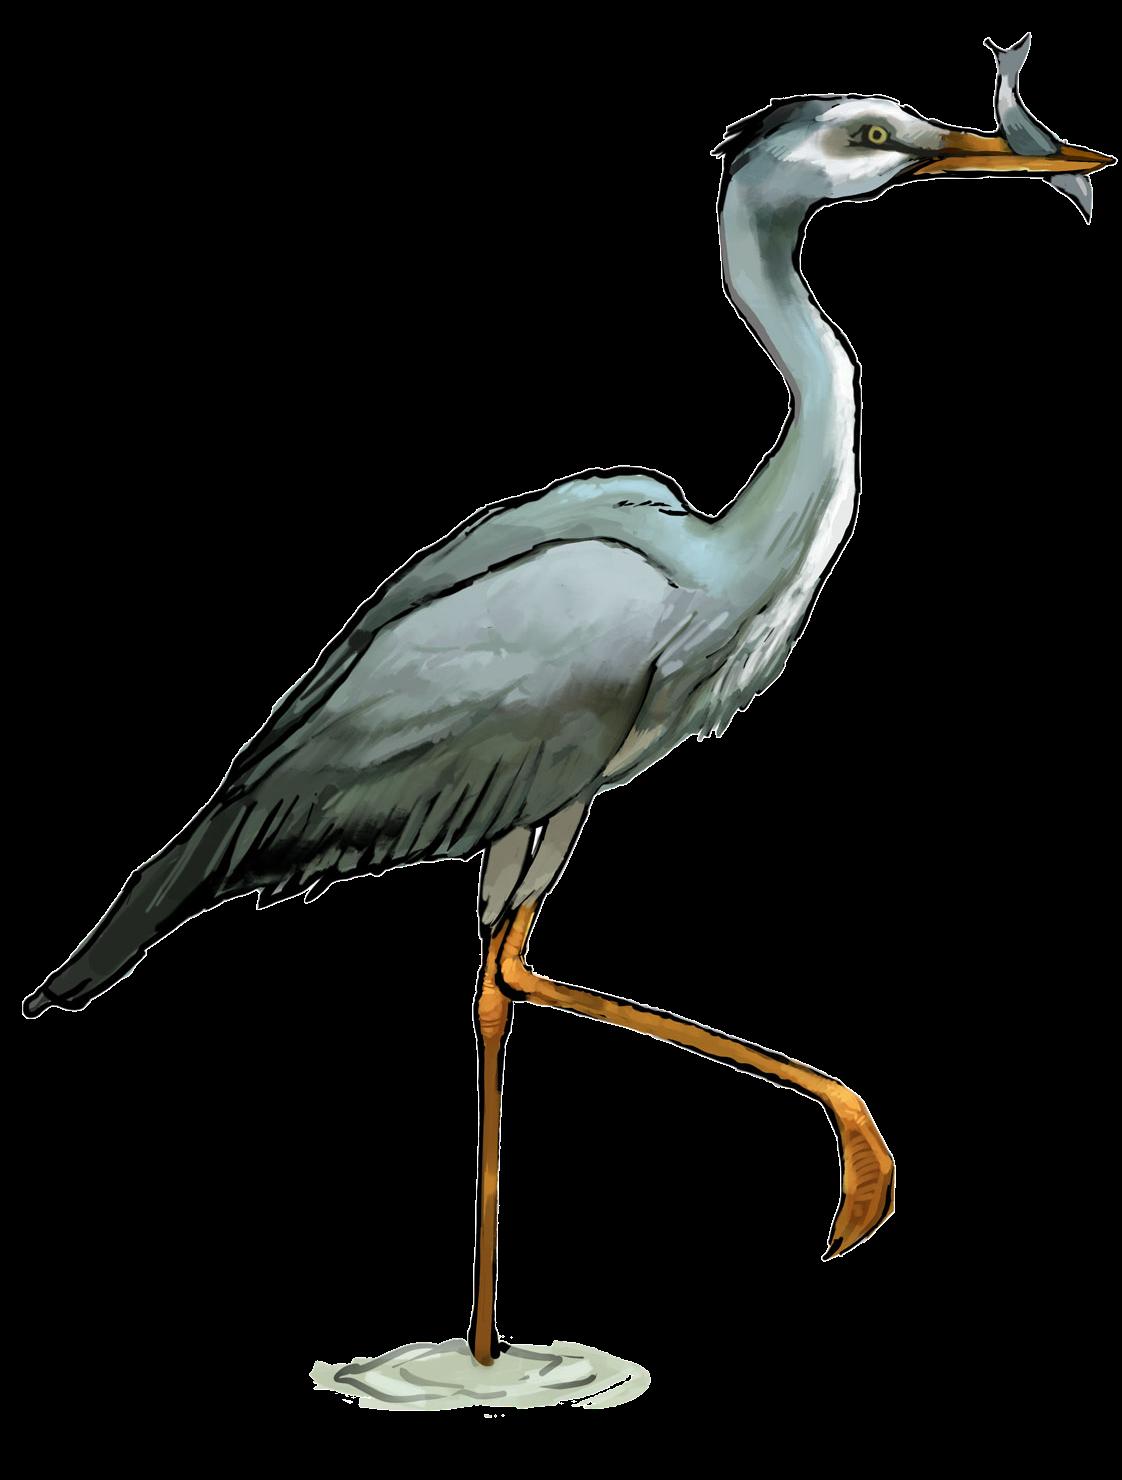 Heron PNG Transparent SVG Clip arts